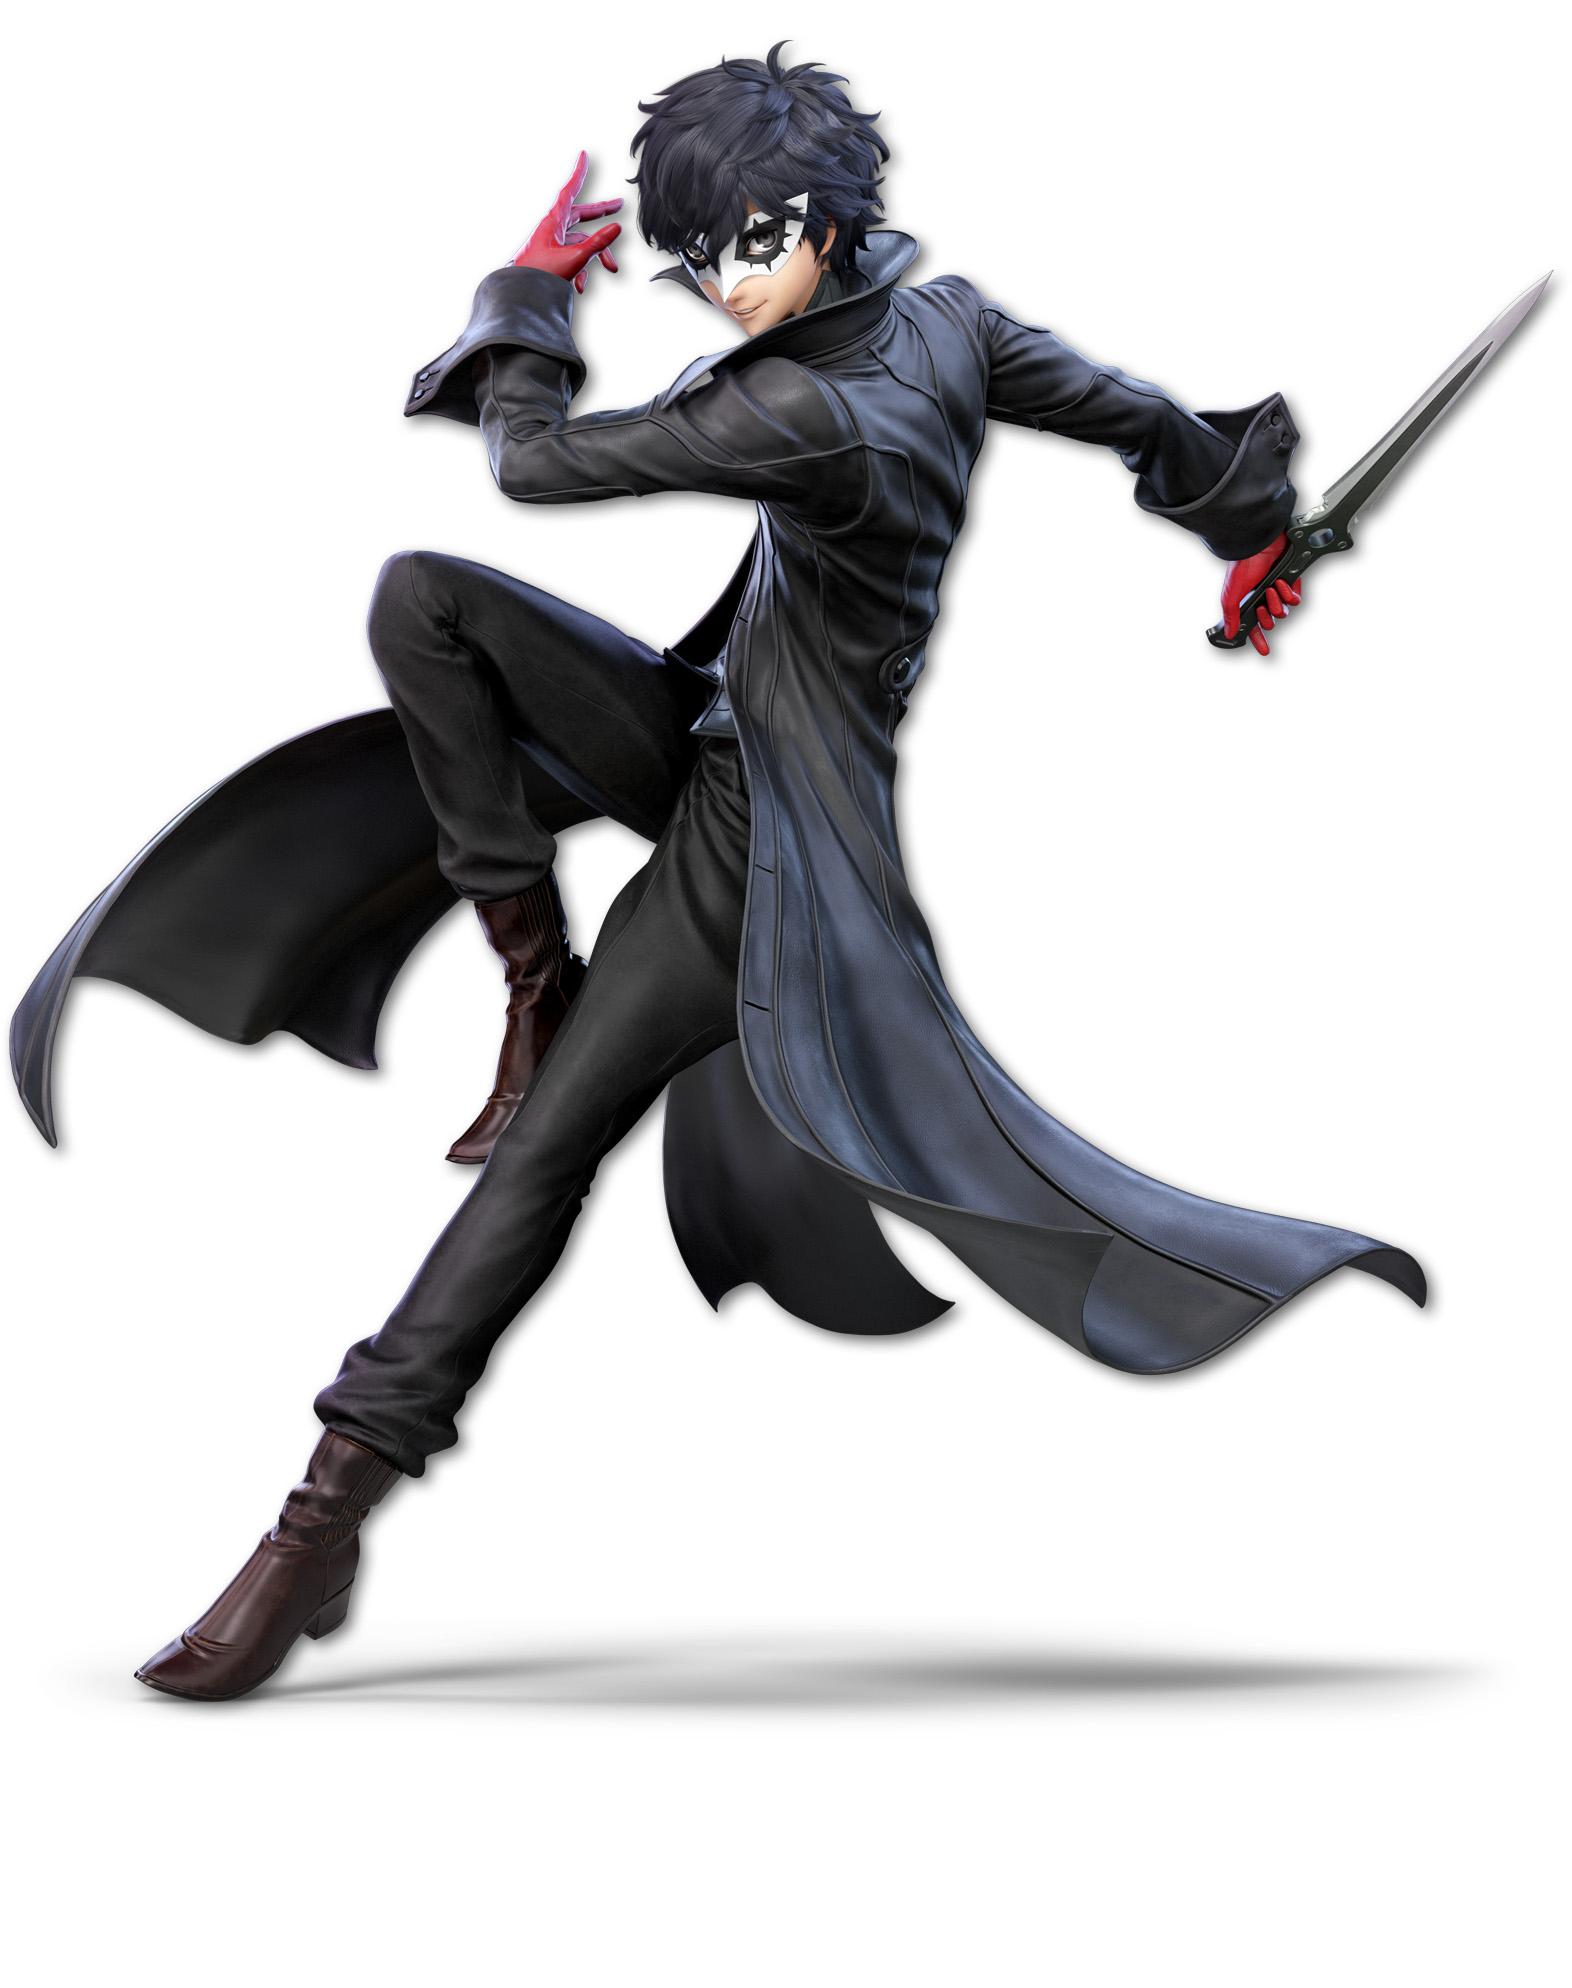 Super Smash Bros Ultimate Joker Render 1